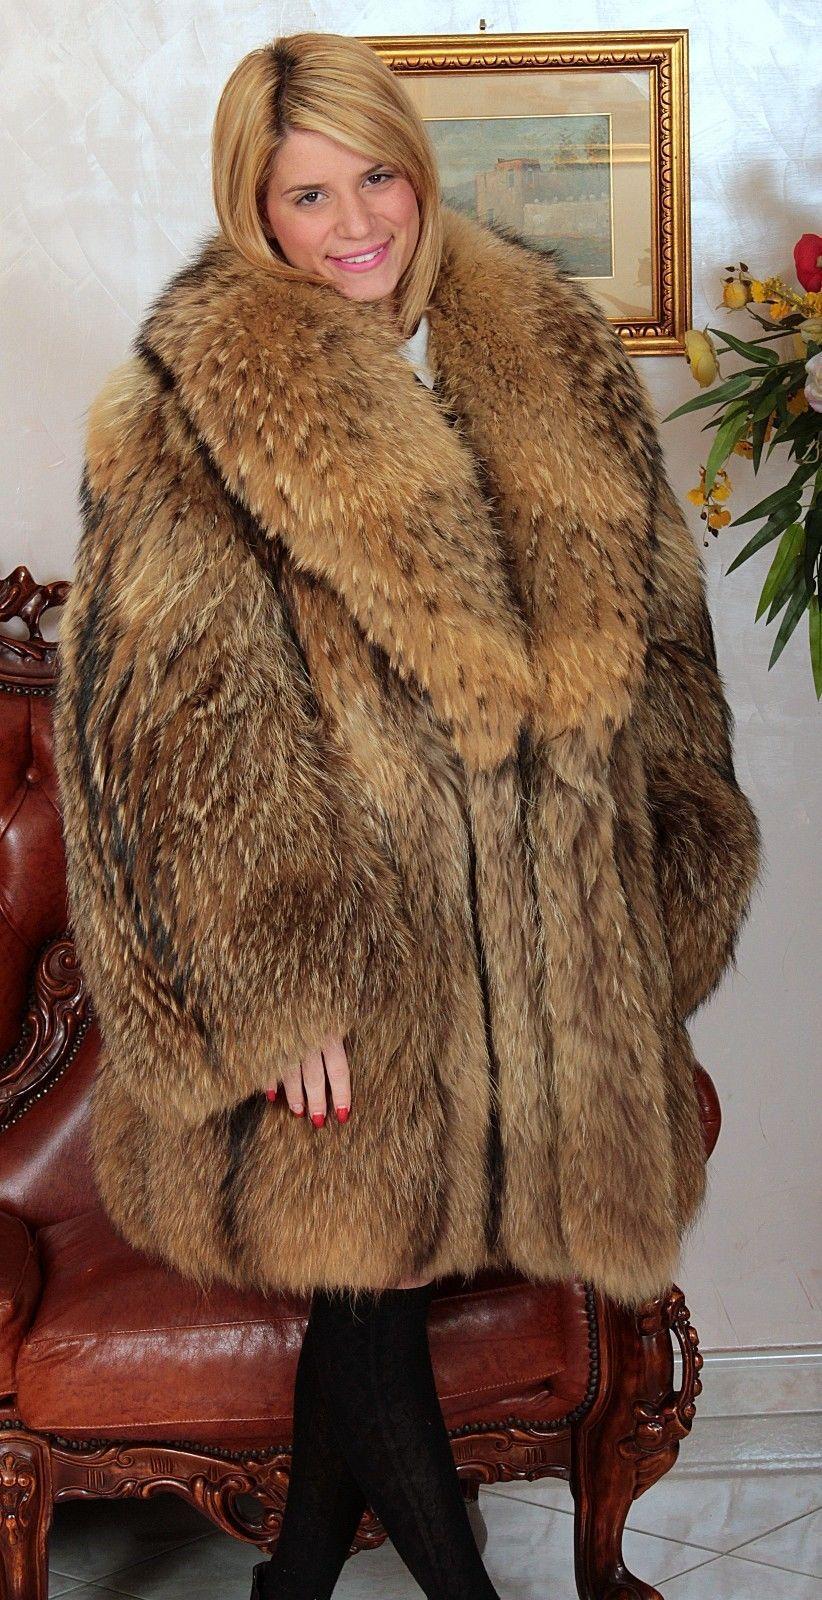 http://www.ebay.com/itm/RACCOON-FUR-COAT-FUCHS-PELZ-MANTEL-FOURRURE-RENARD-PELLICCIA-VOLPE-MURMASKY-mex-/262223359991?hash=item3d0dbaeff7:g:DrUAAOSwk1JWg90g